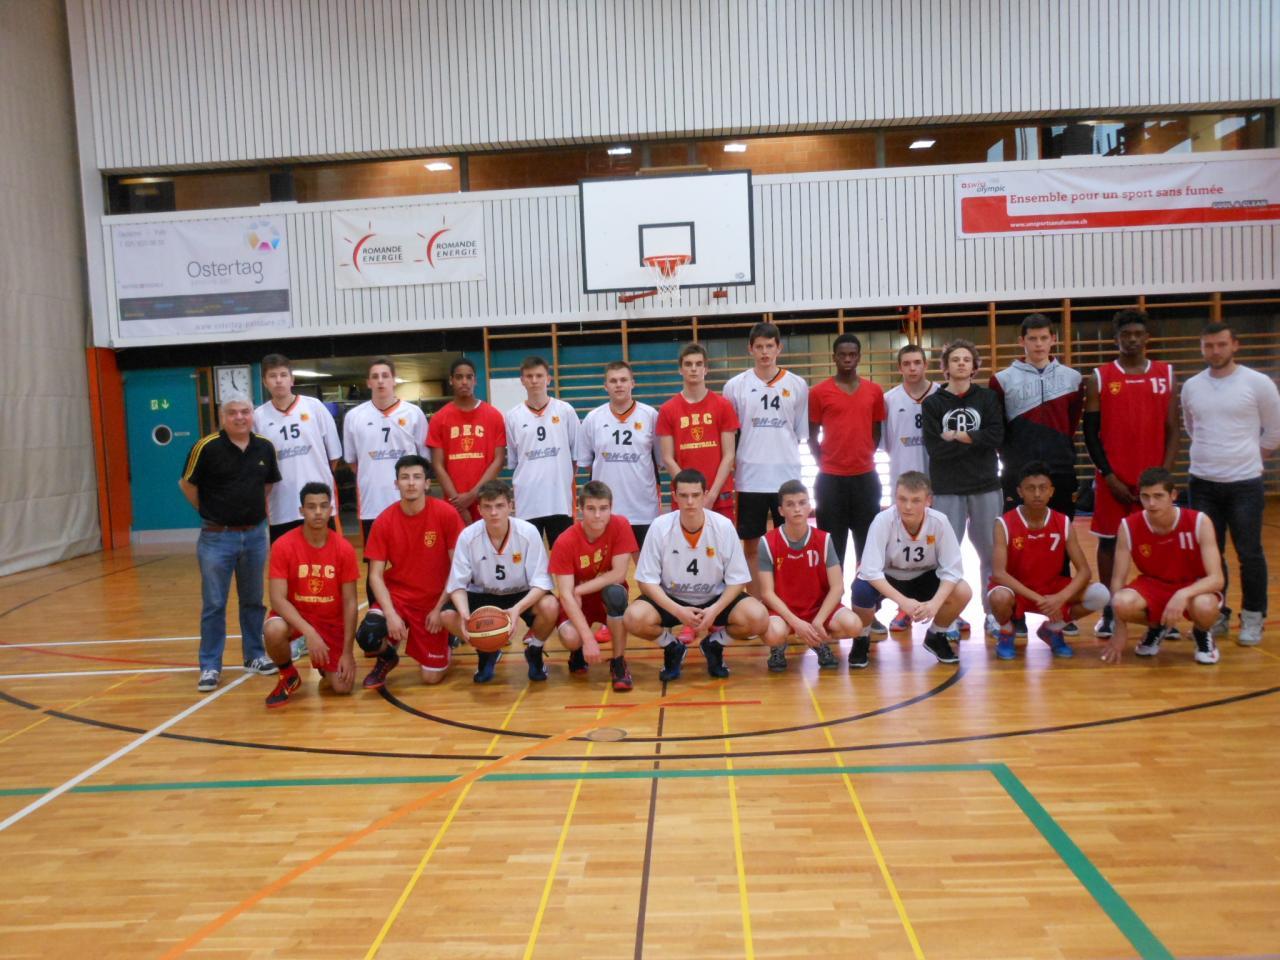 Tournoi International Jeunesse en Suisse